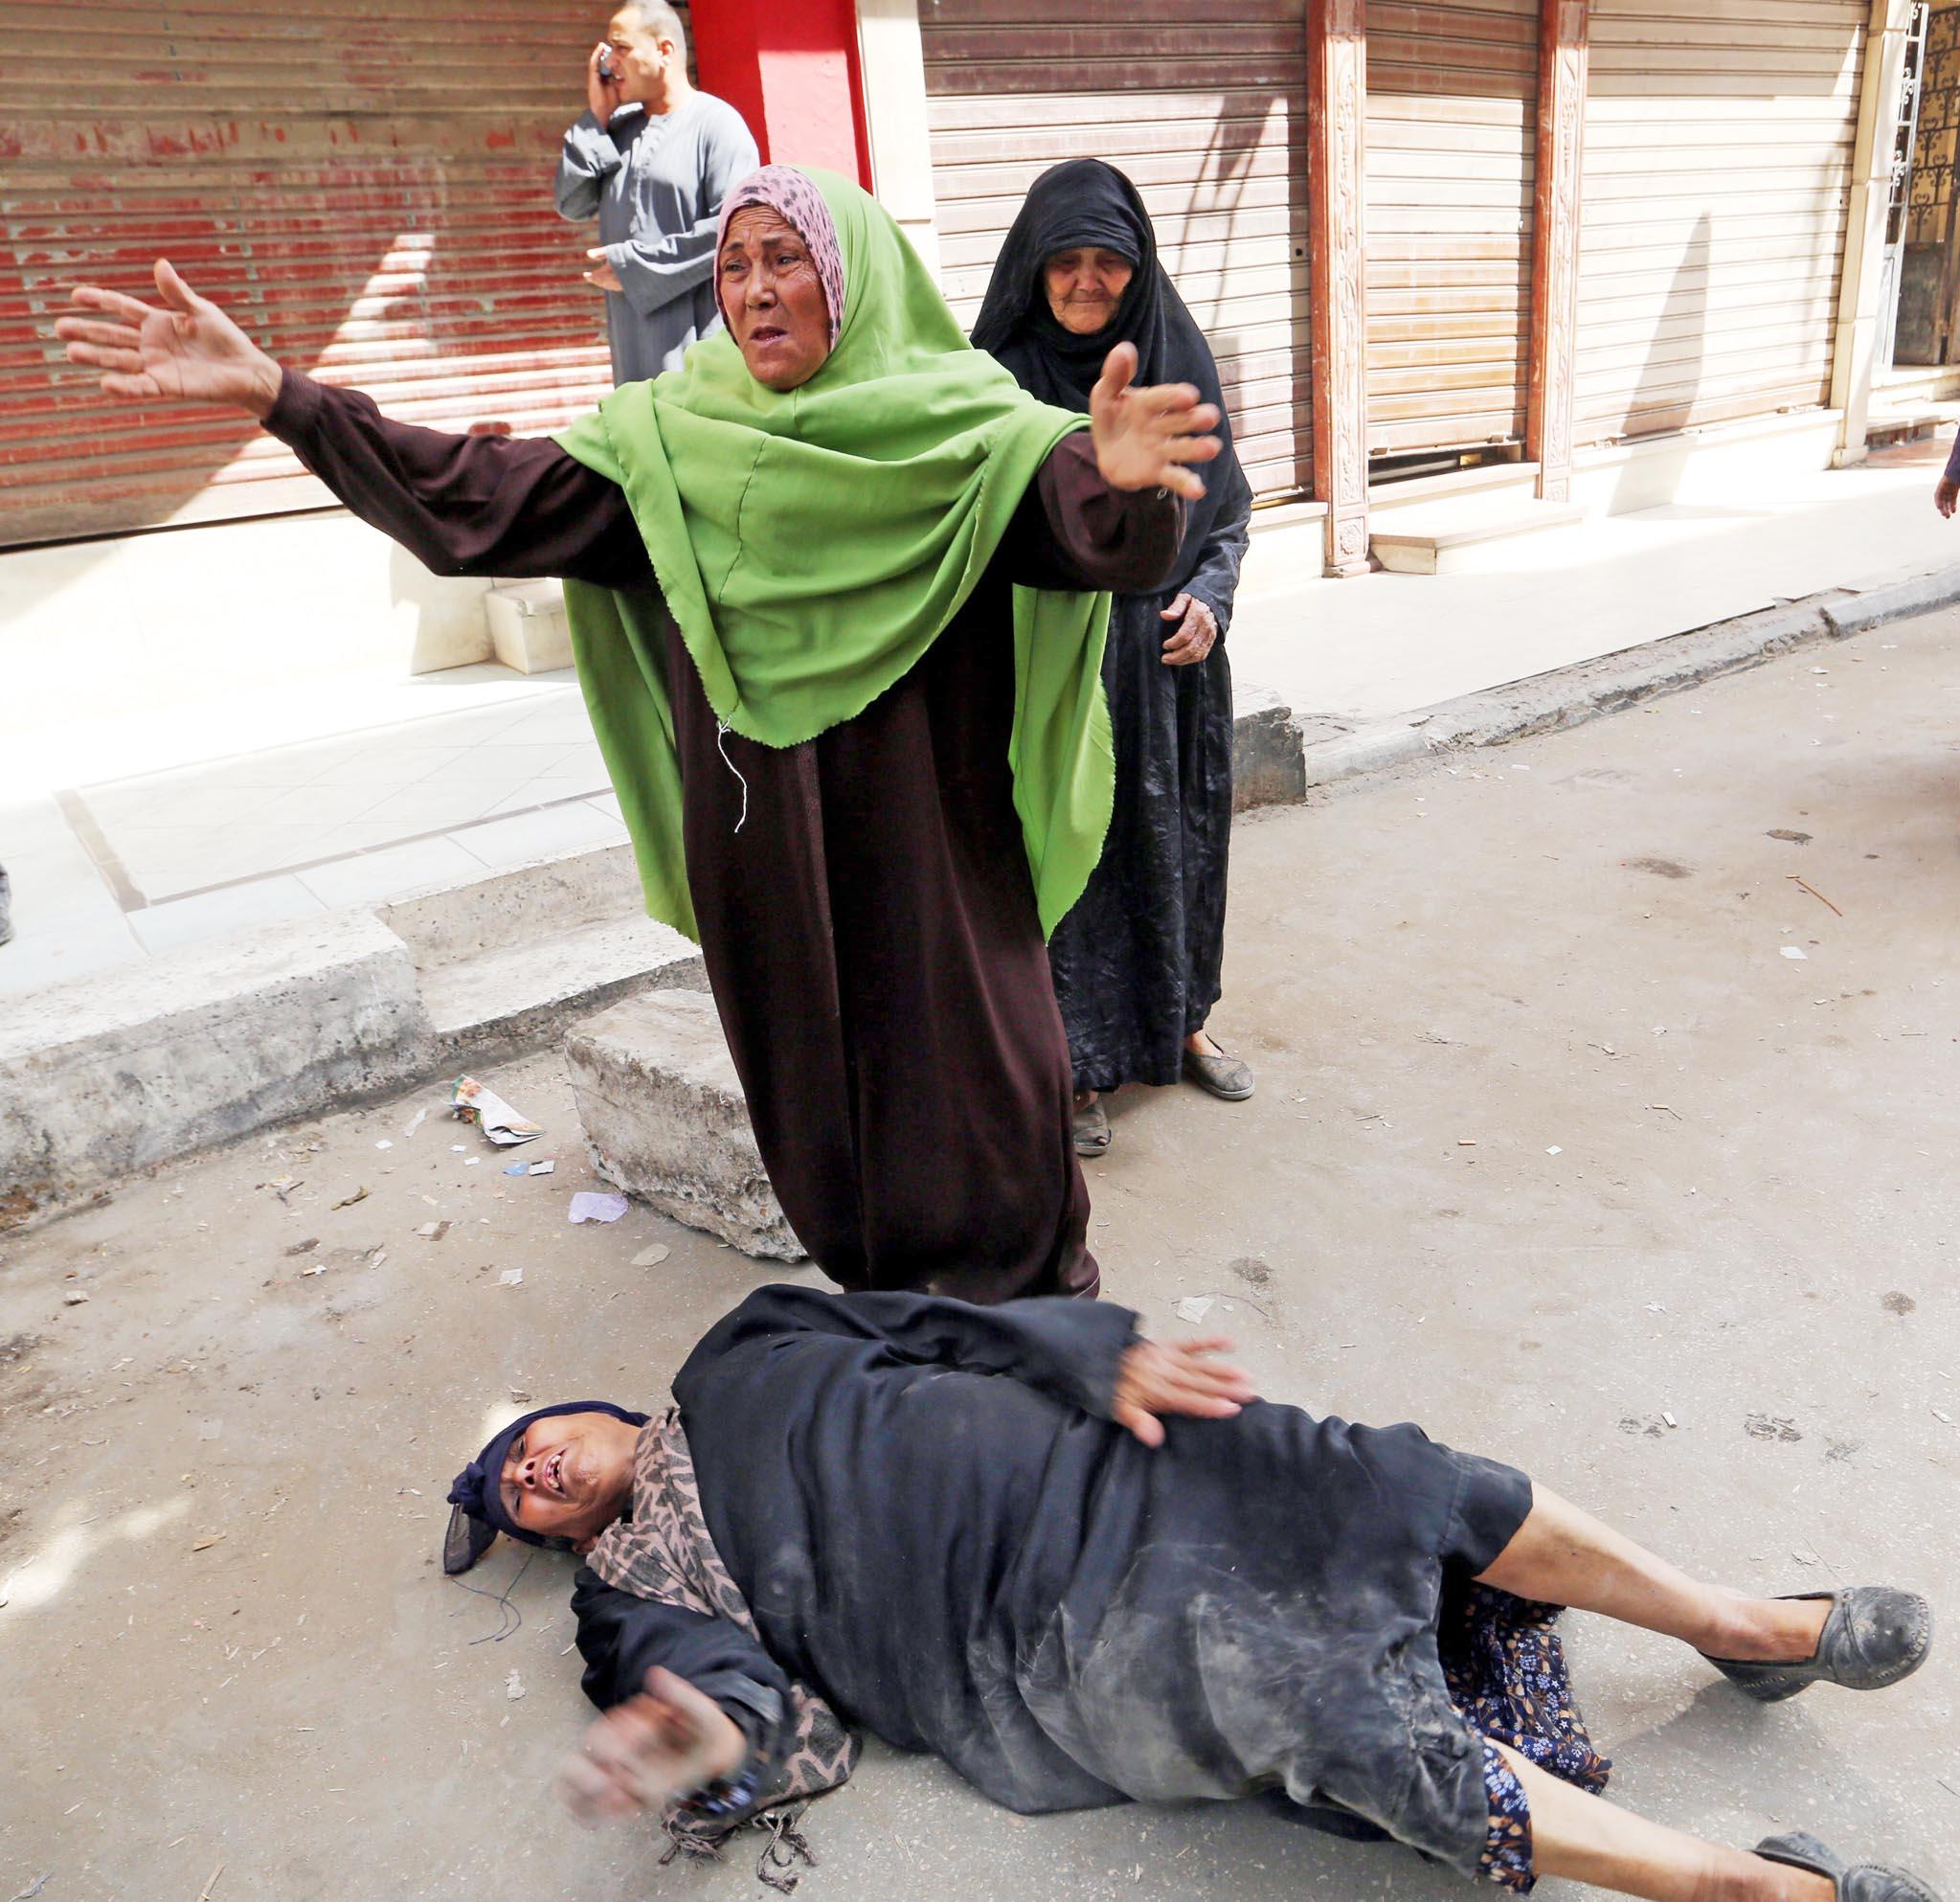 Egypt sentences to death 683, including Muslim Brotherhood leader